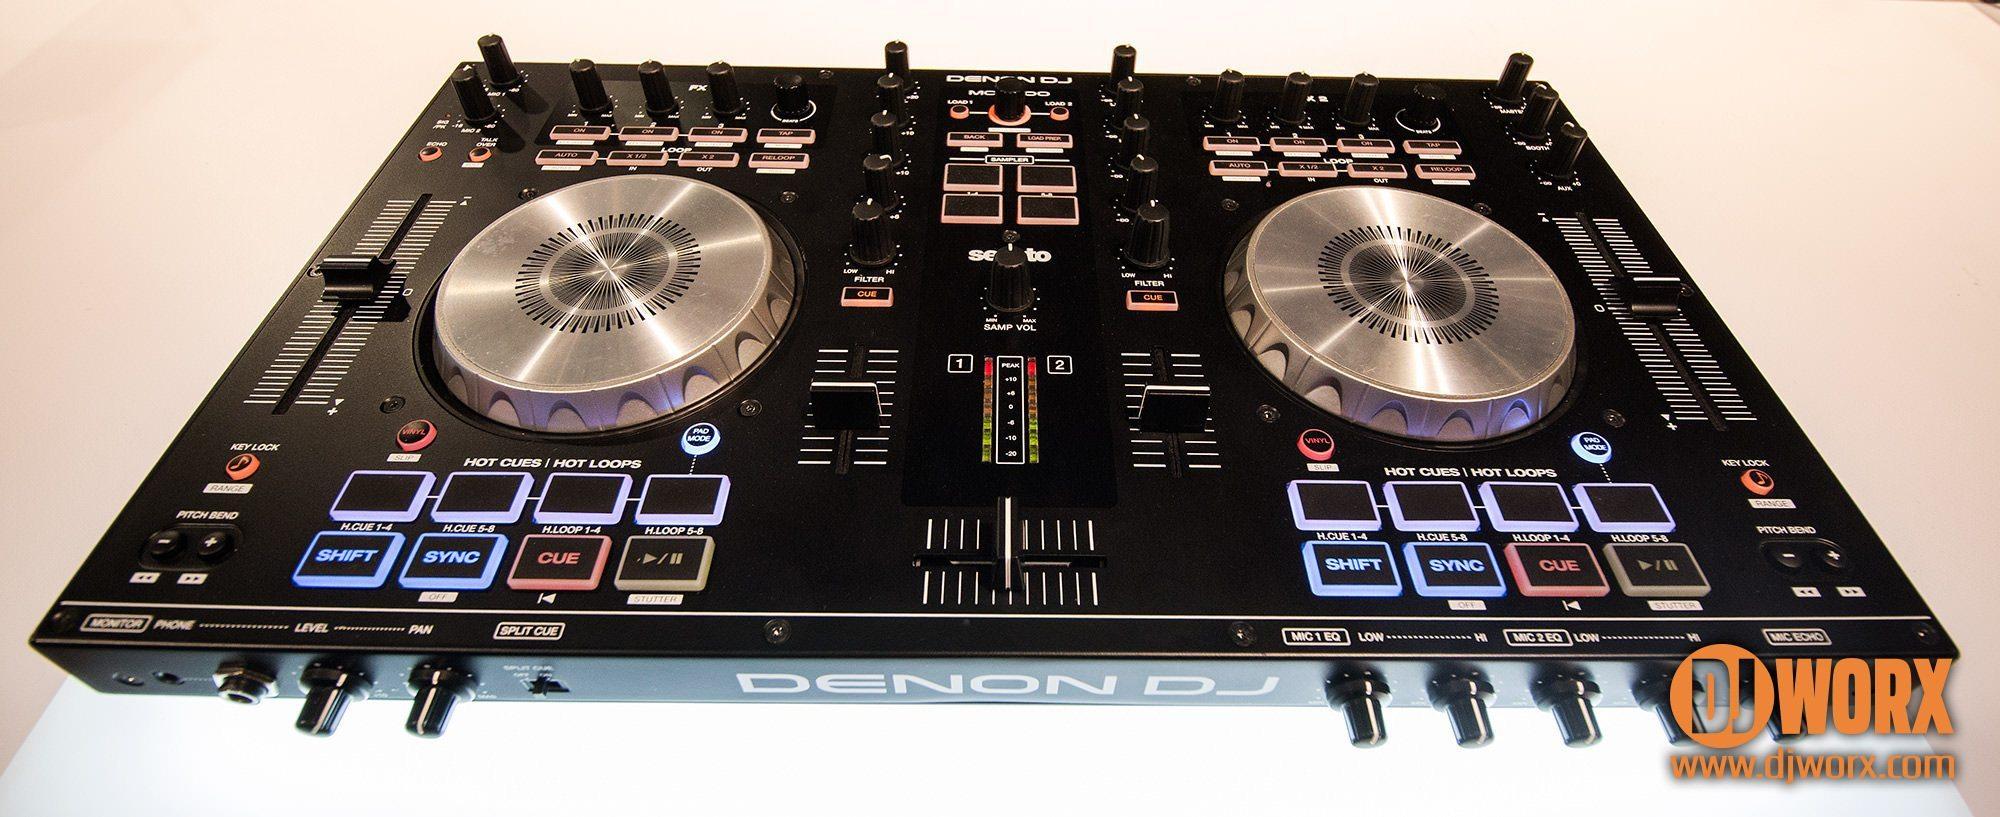 namm 2015  denon dj mc4000 controller  with pics